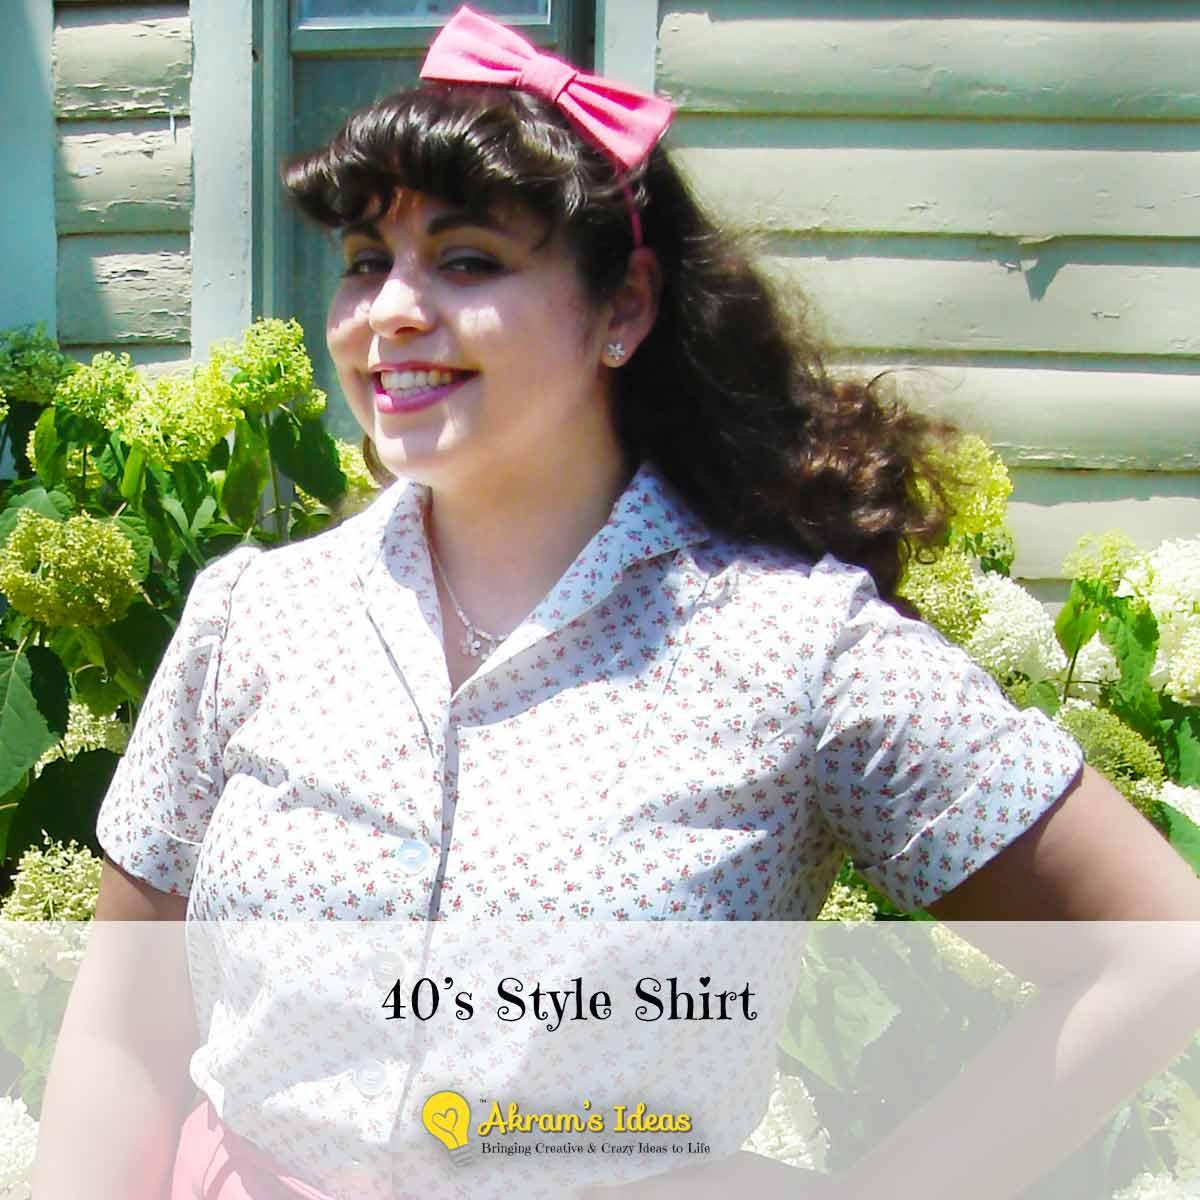 40's Style Shirt